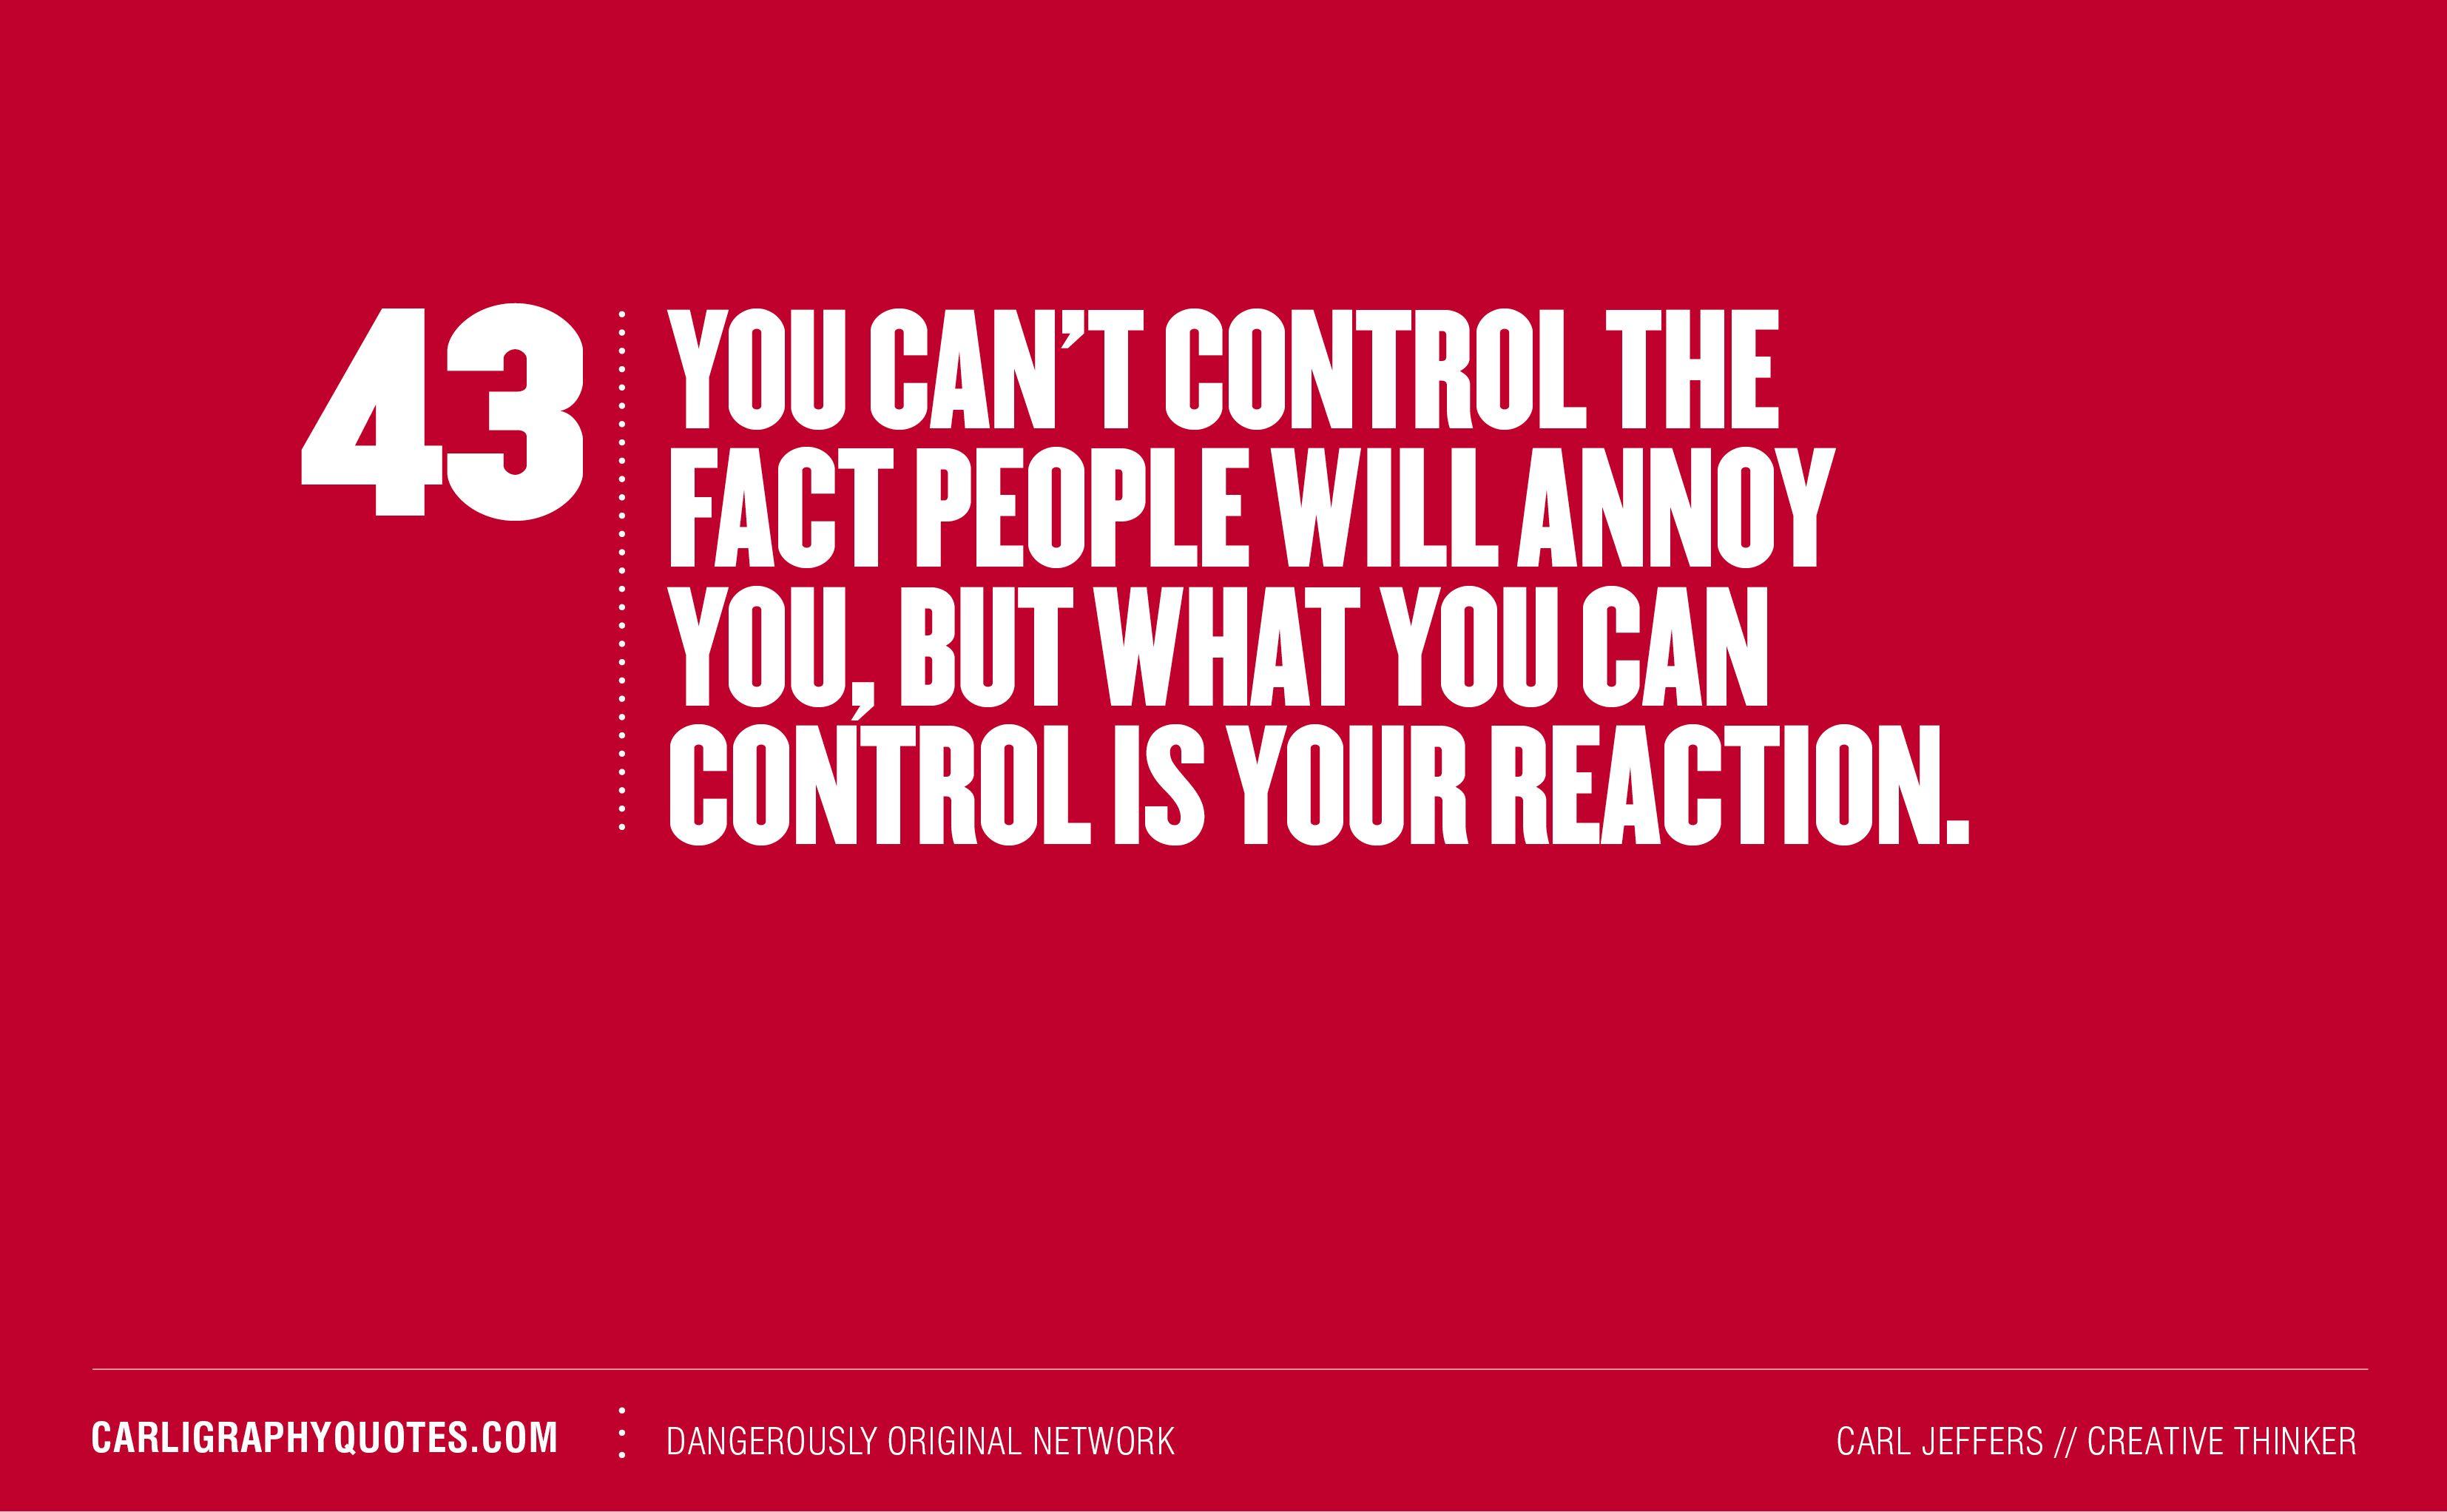 7 Ways to Teach Self-Control